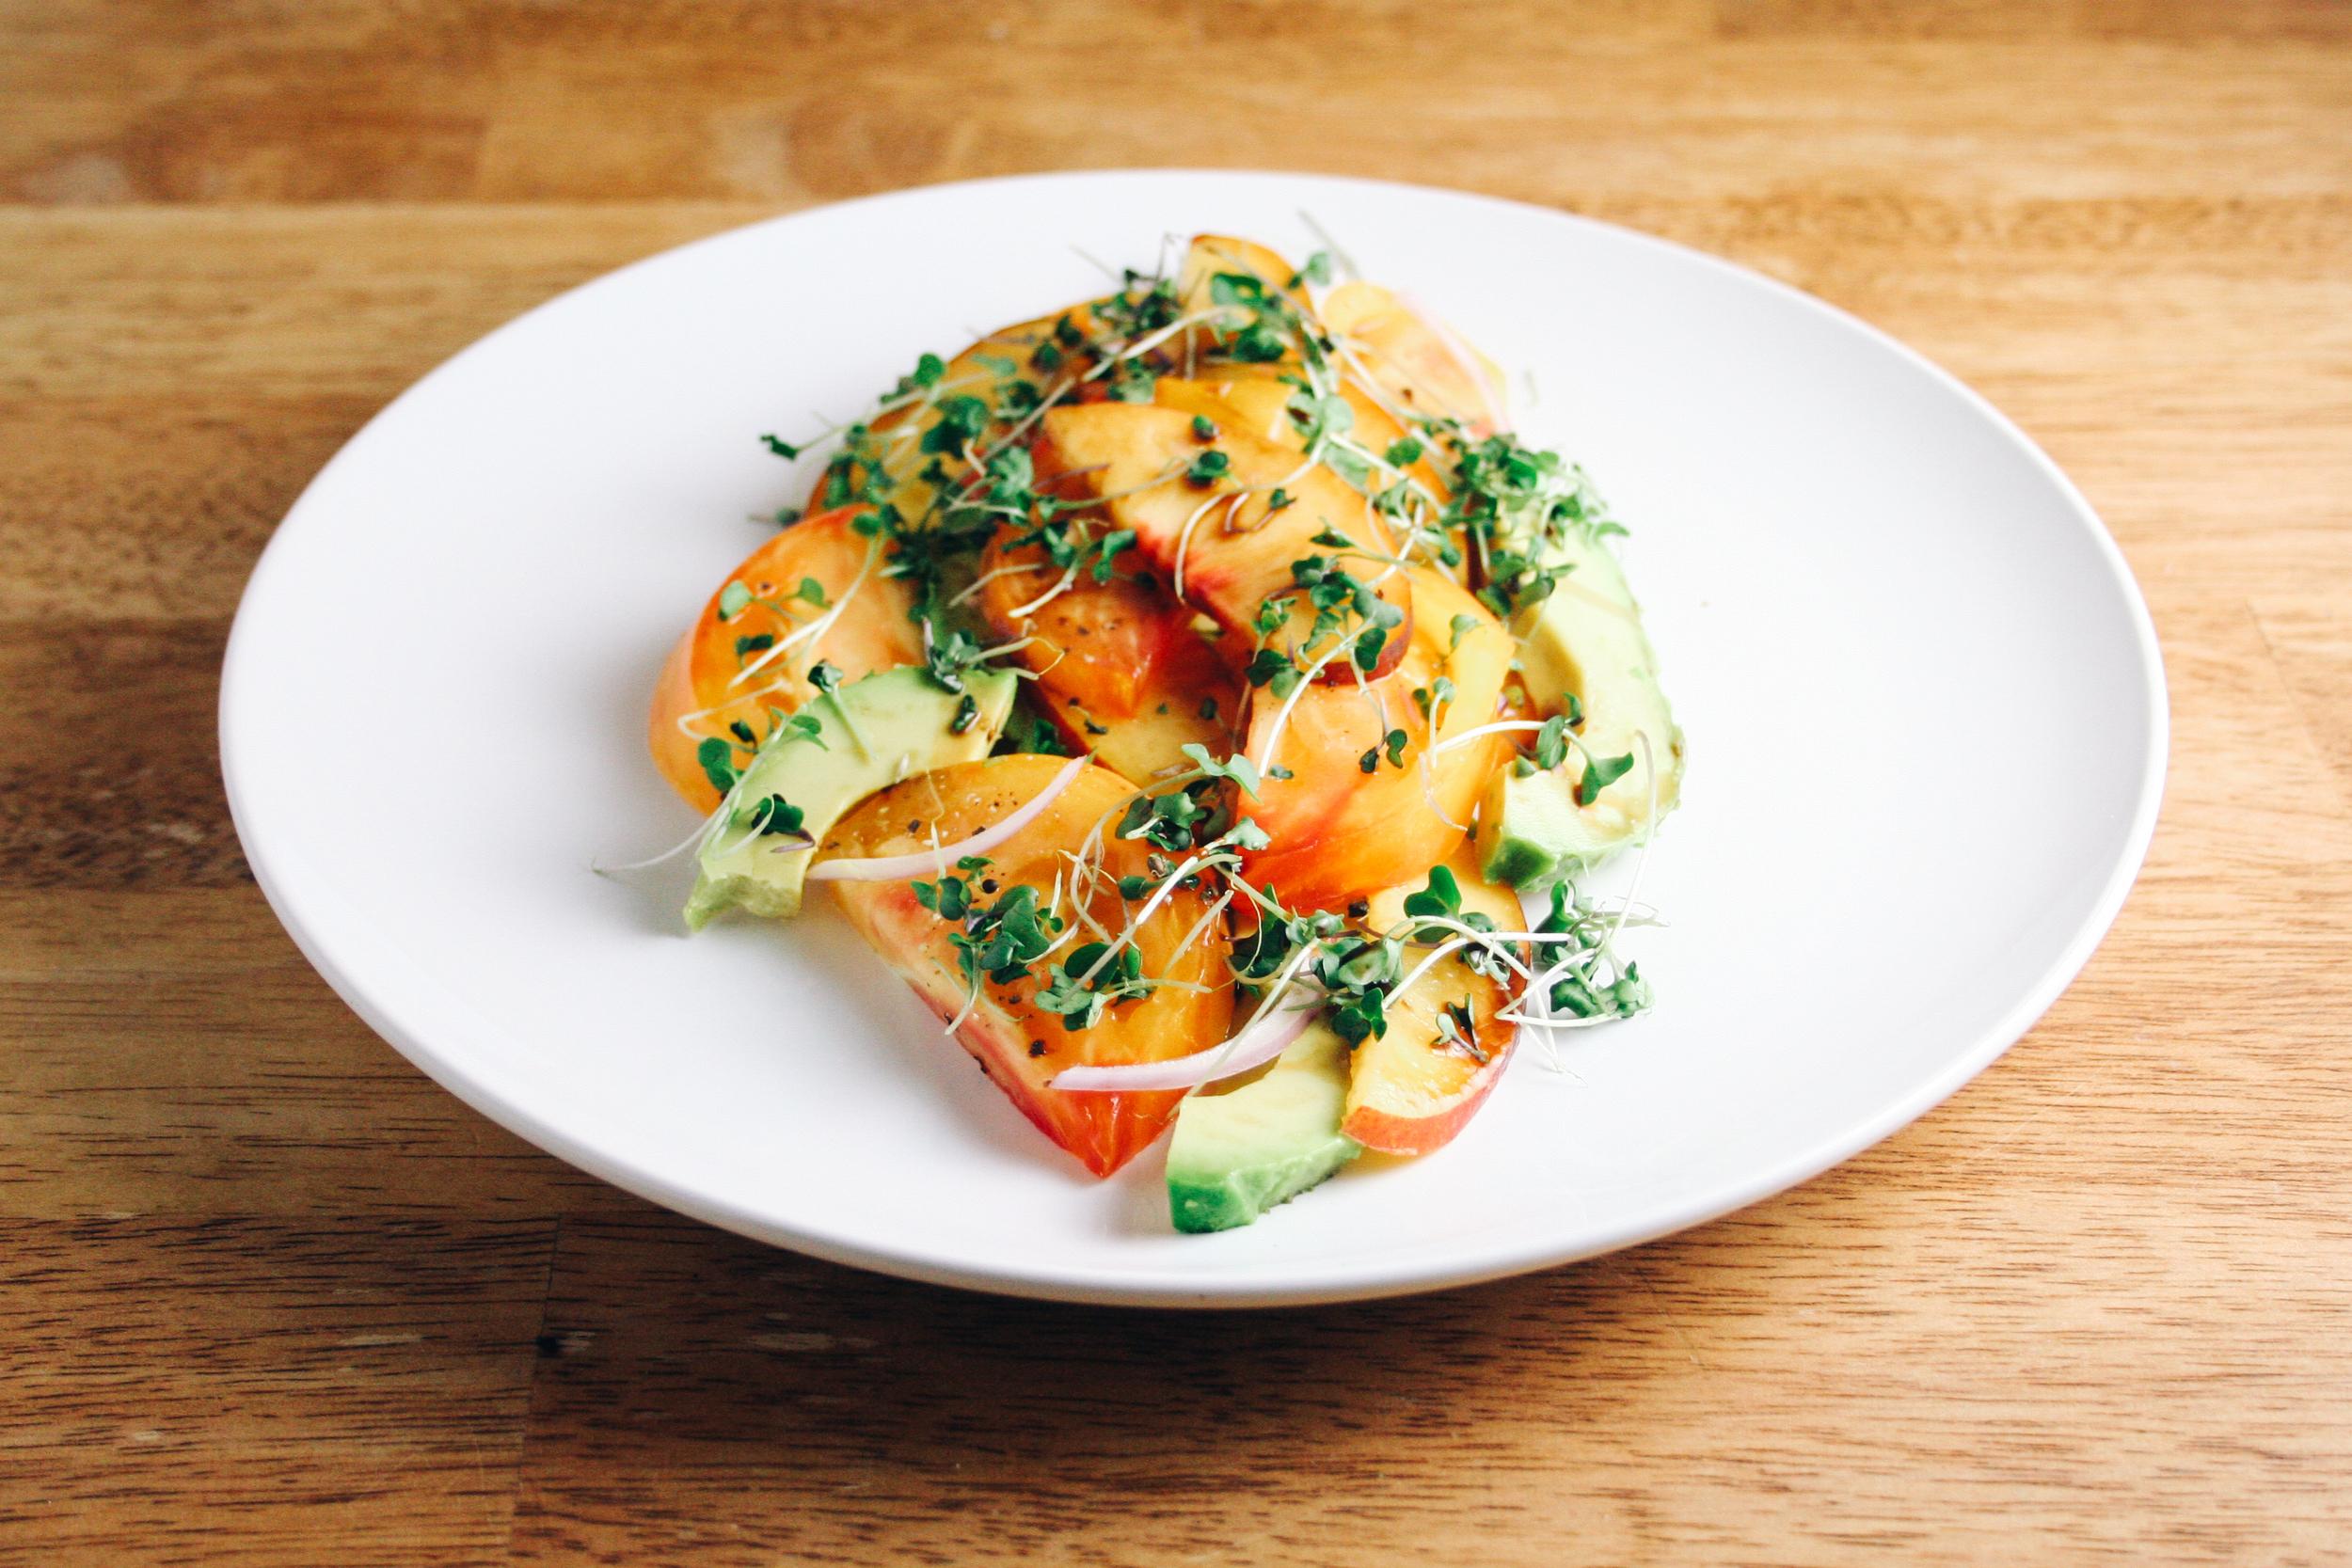 Heirloom Tomato, Nectarine, and Avocado Salad